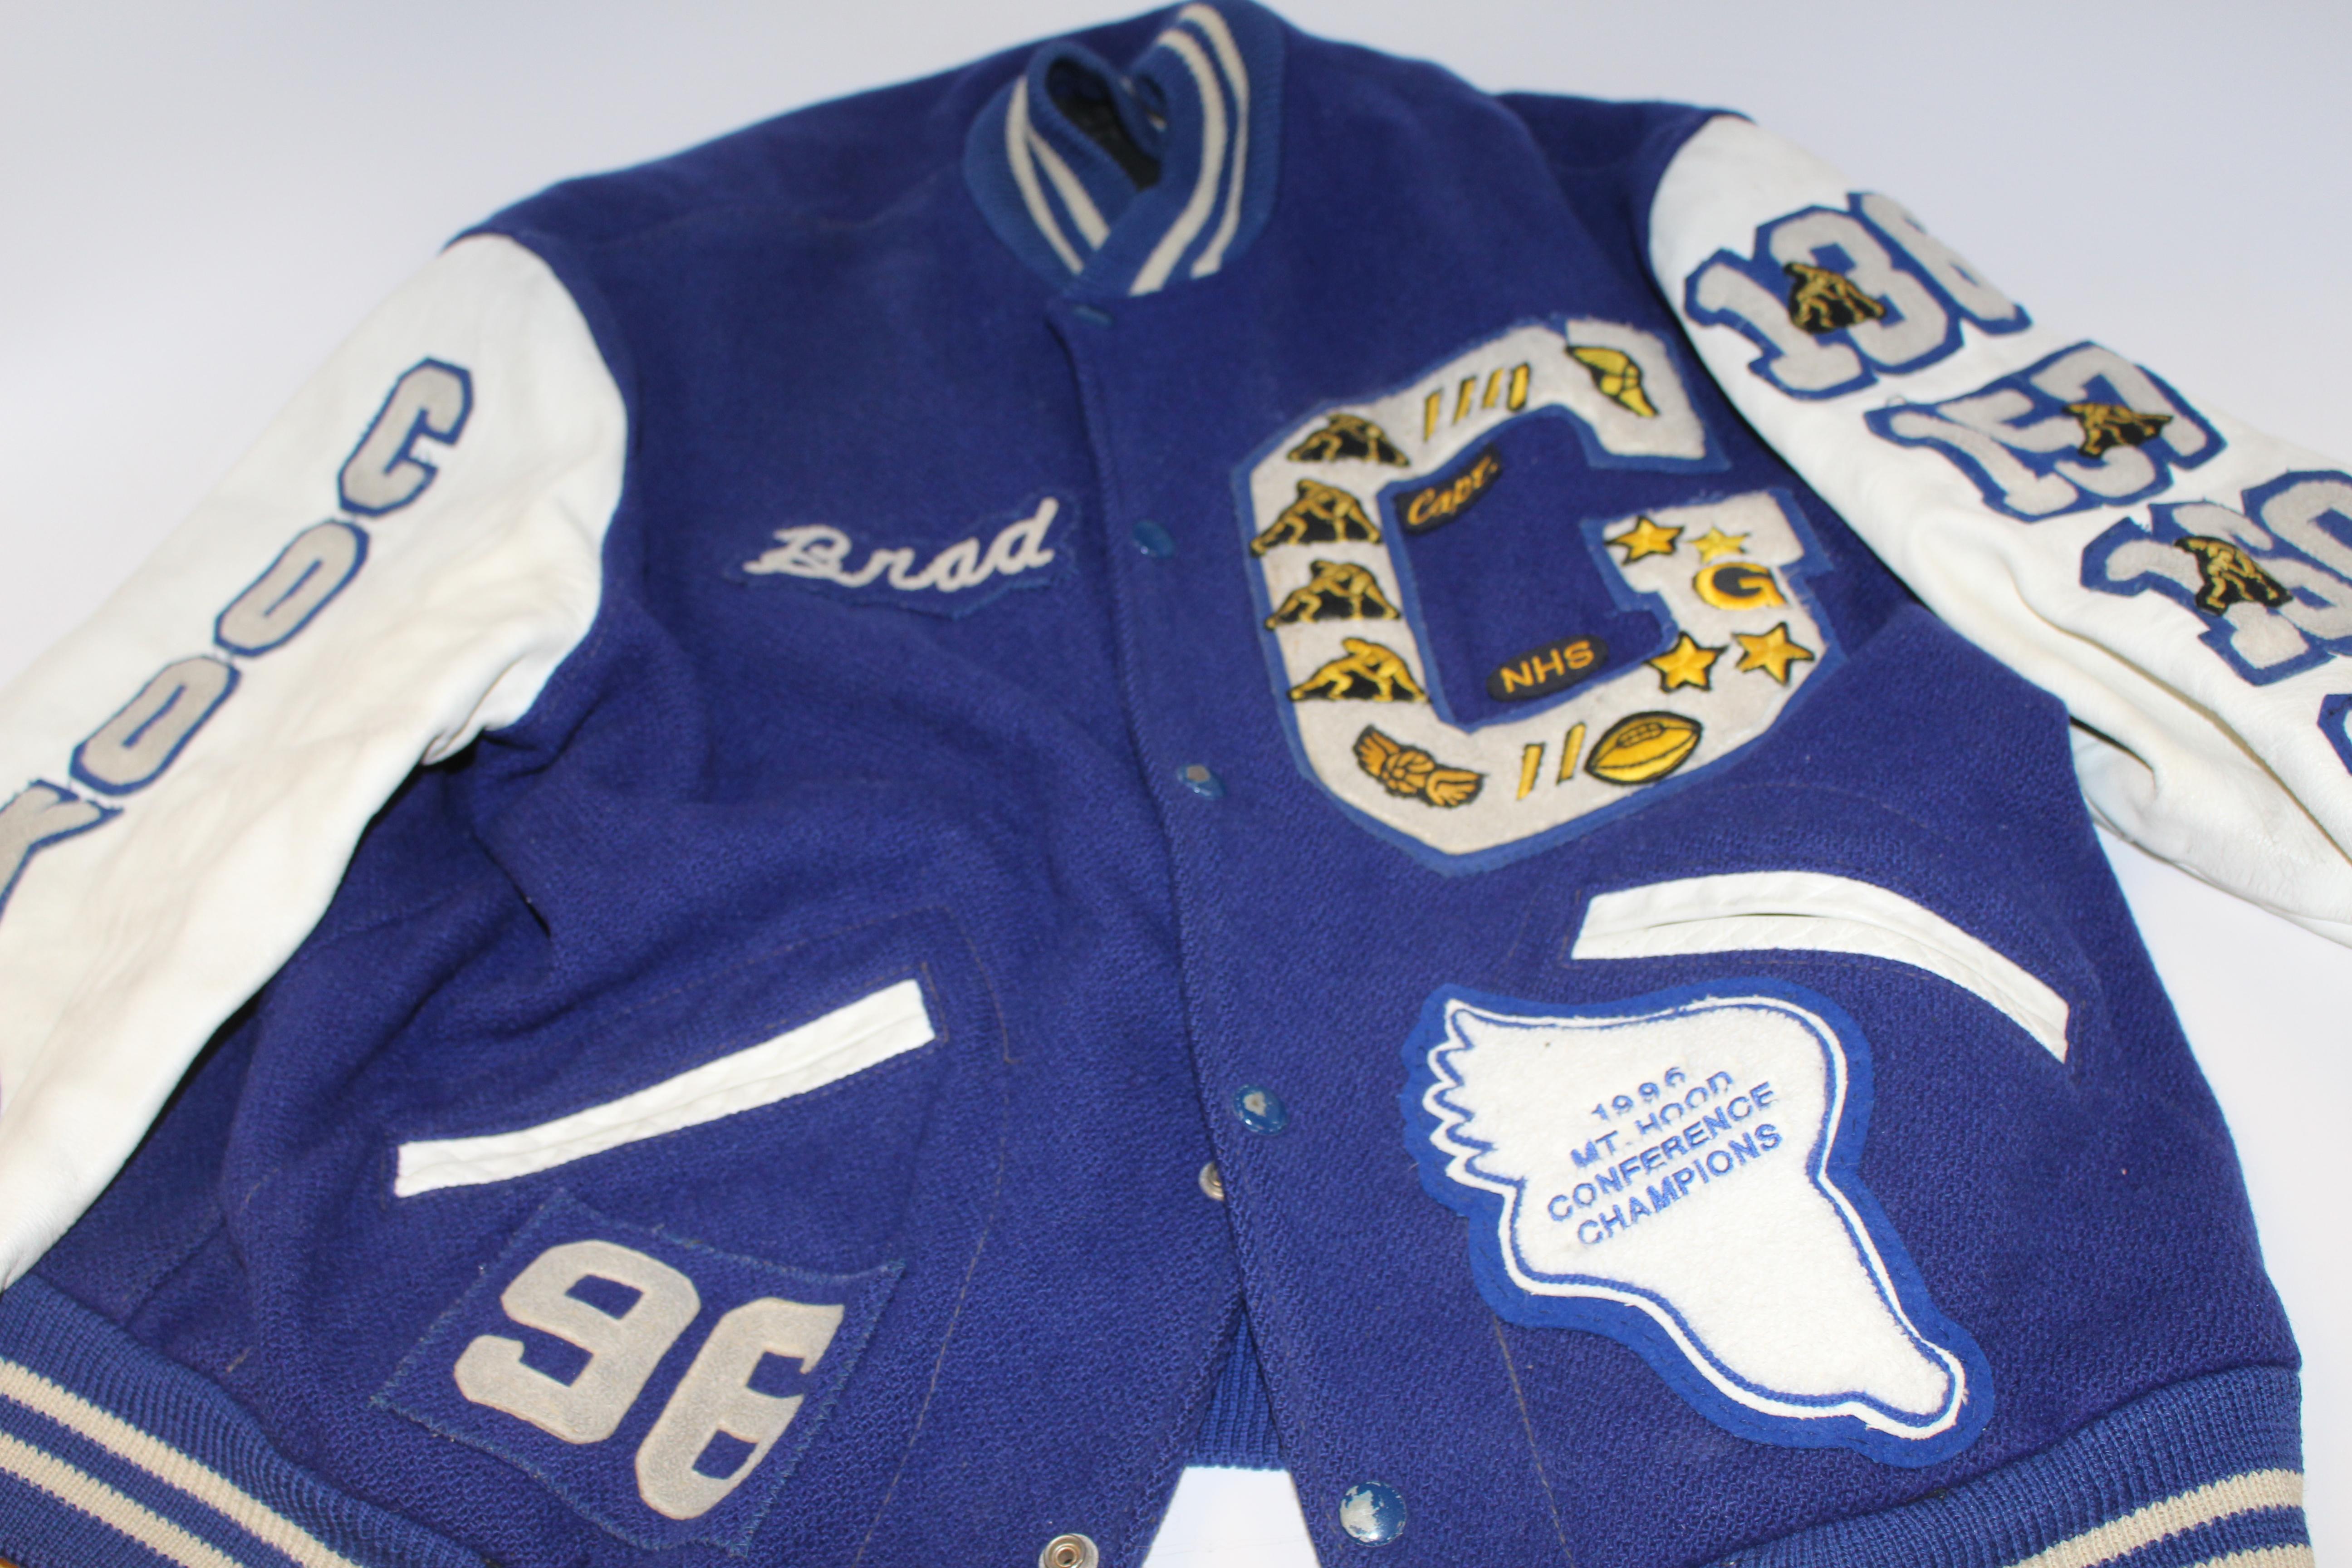 Graphic Design teacher Brad Cook's varsity letterman jacket from 1996.